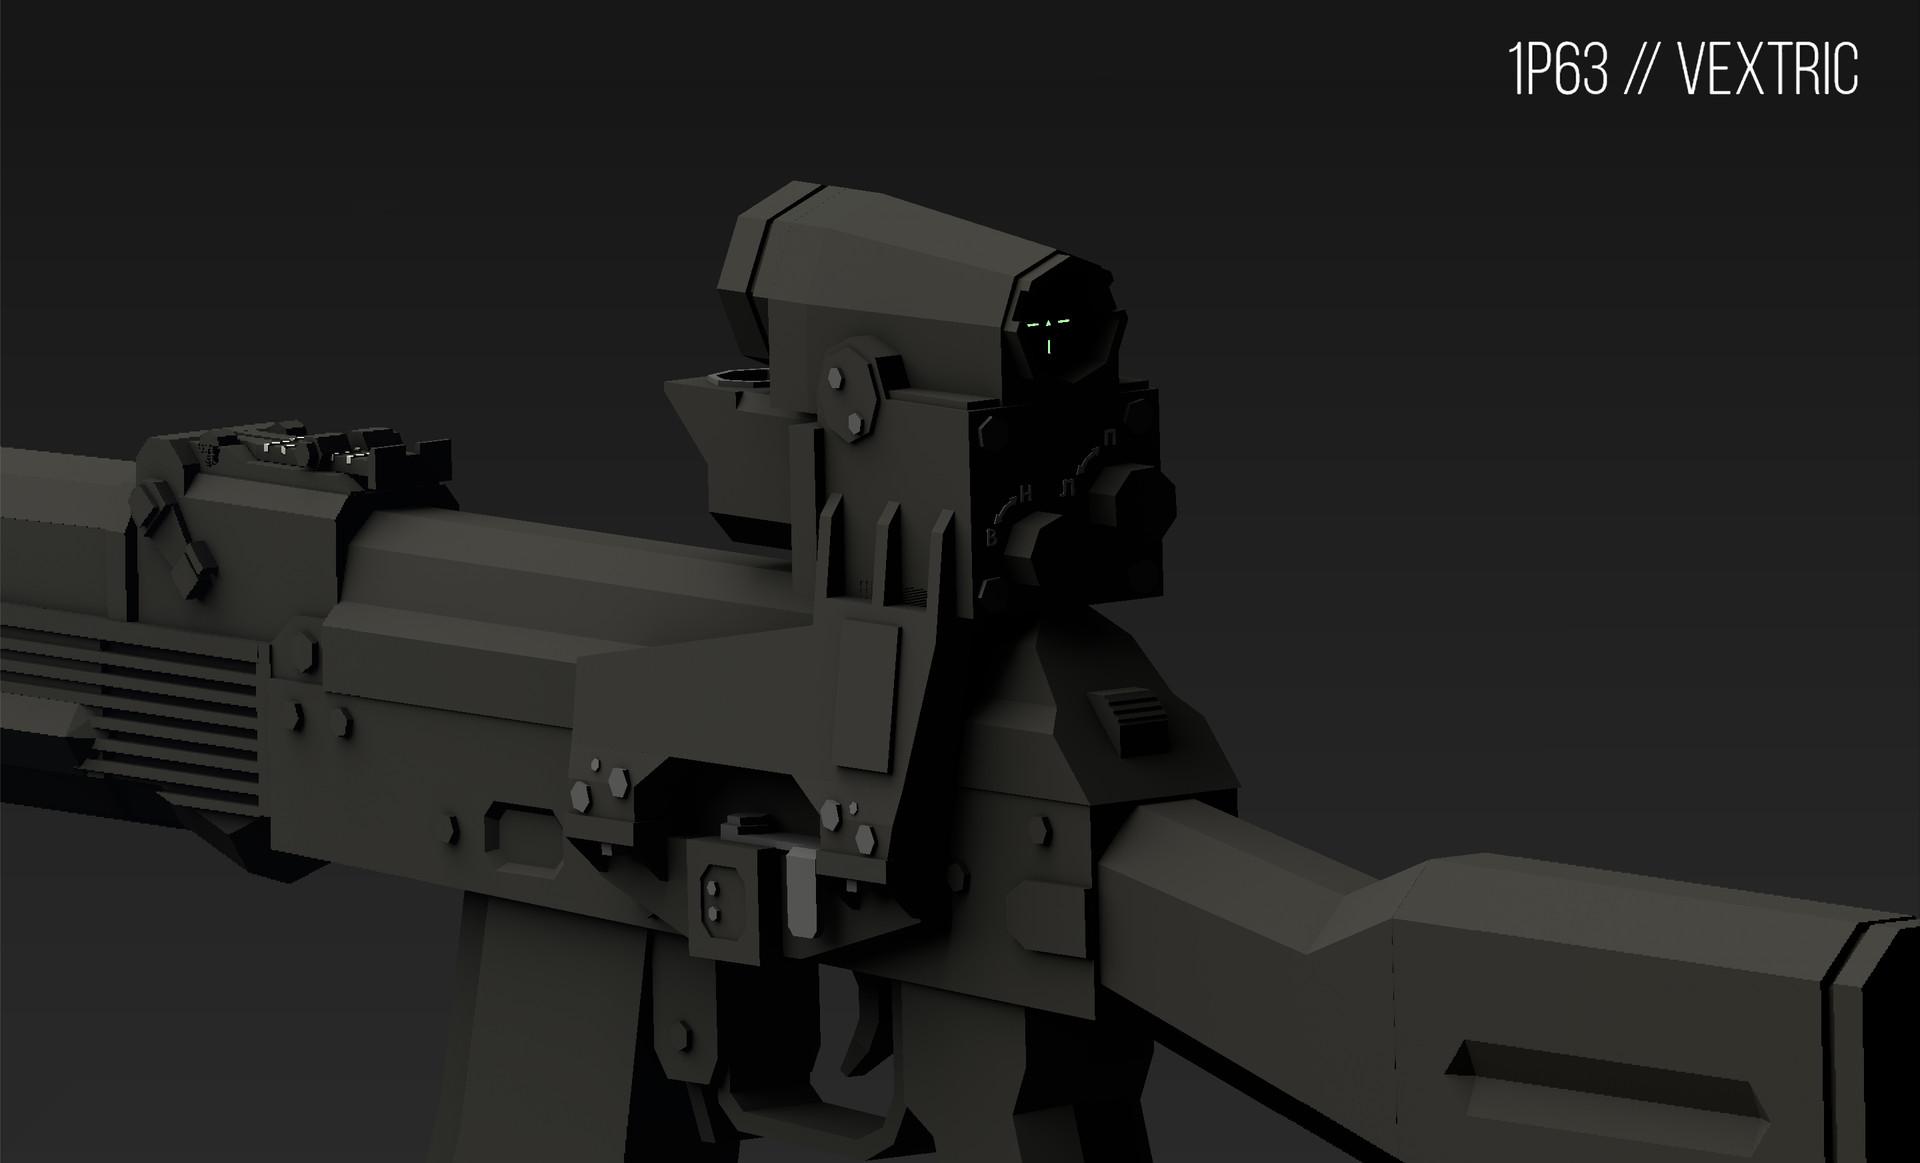 Vextric _ - Obzor 1P63